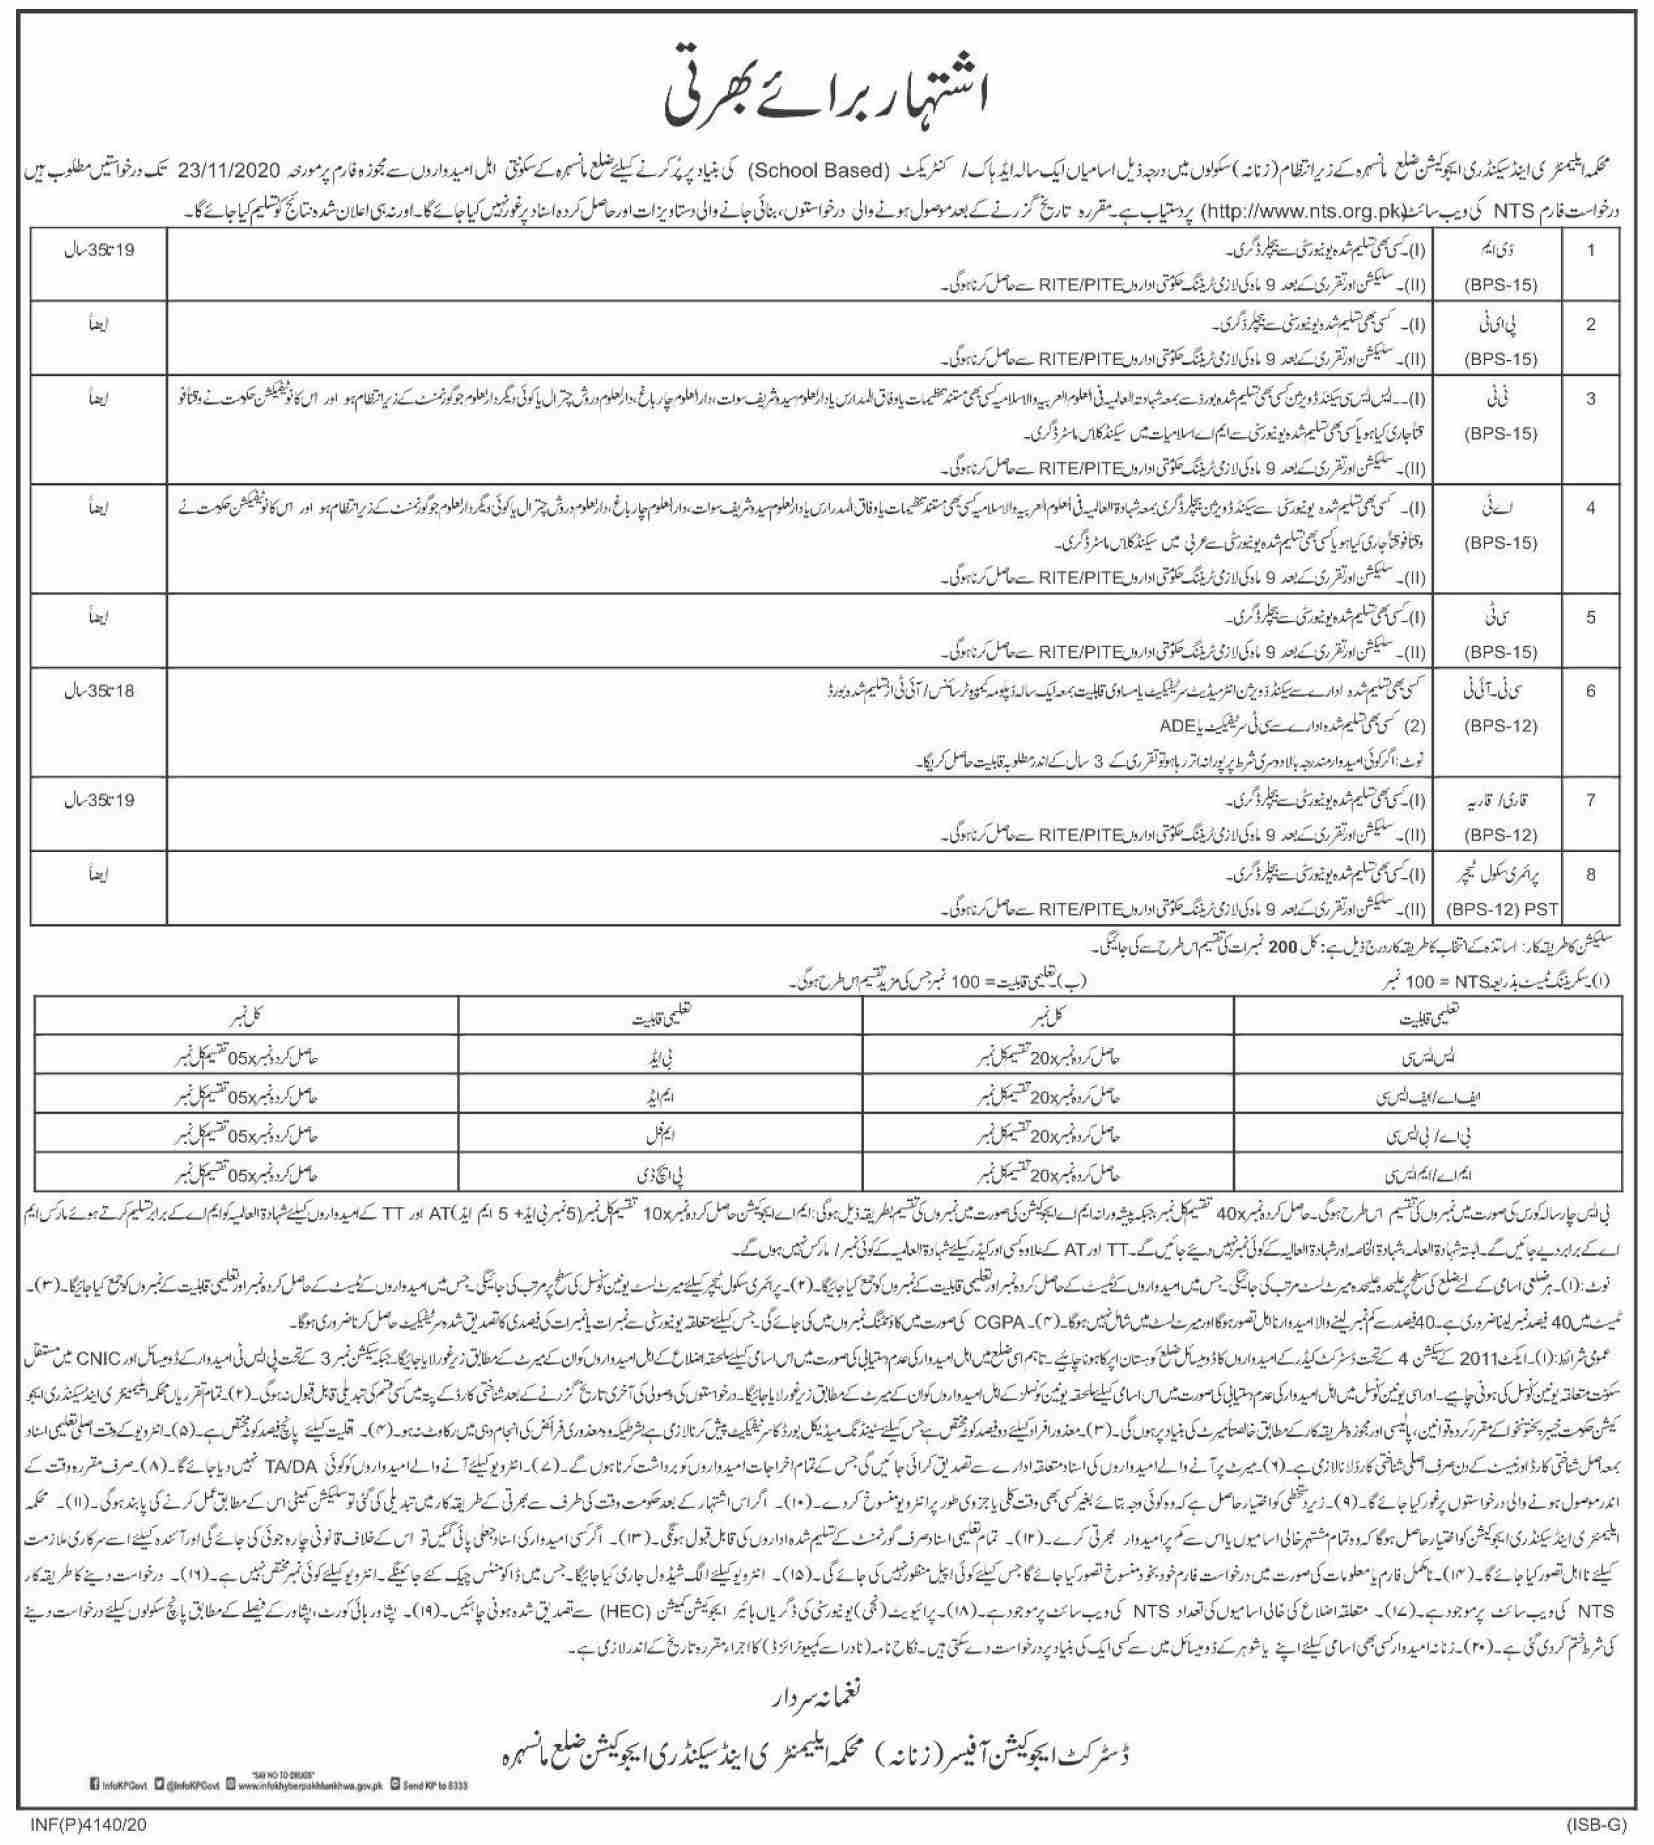 Elementary & Secondary Education Department KPK Latest Jobs in Pakistan via NTS Website - www.nts.org.pk